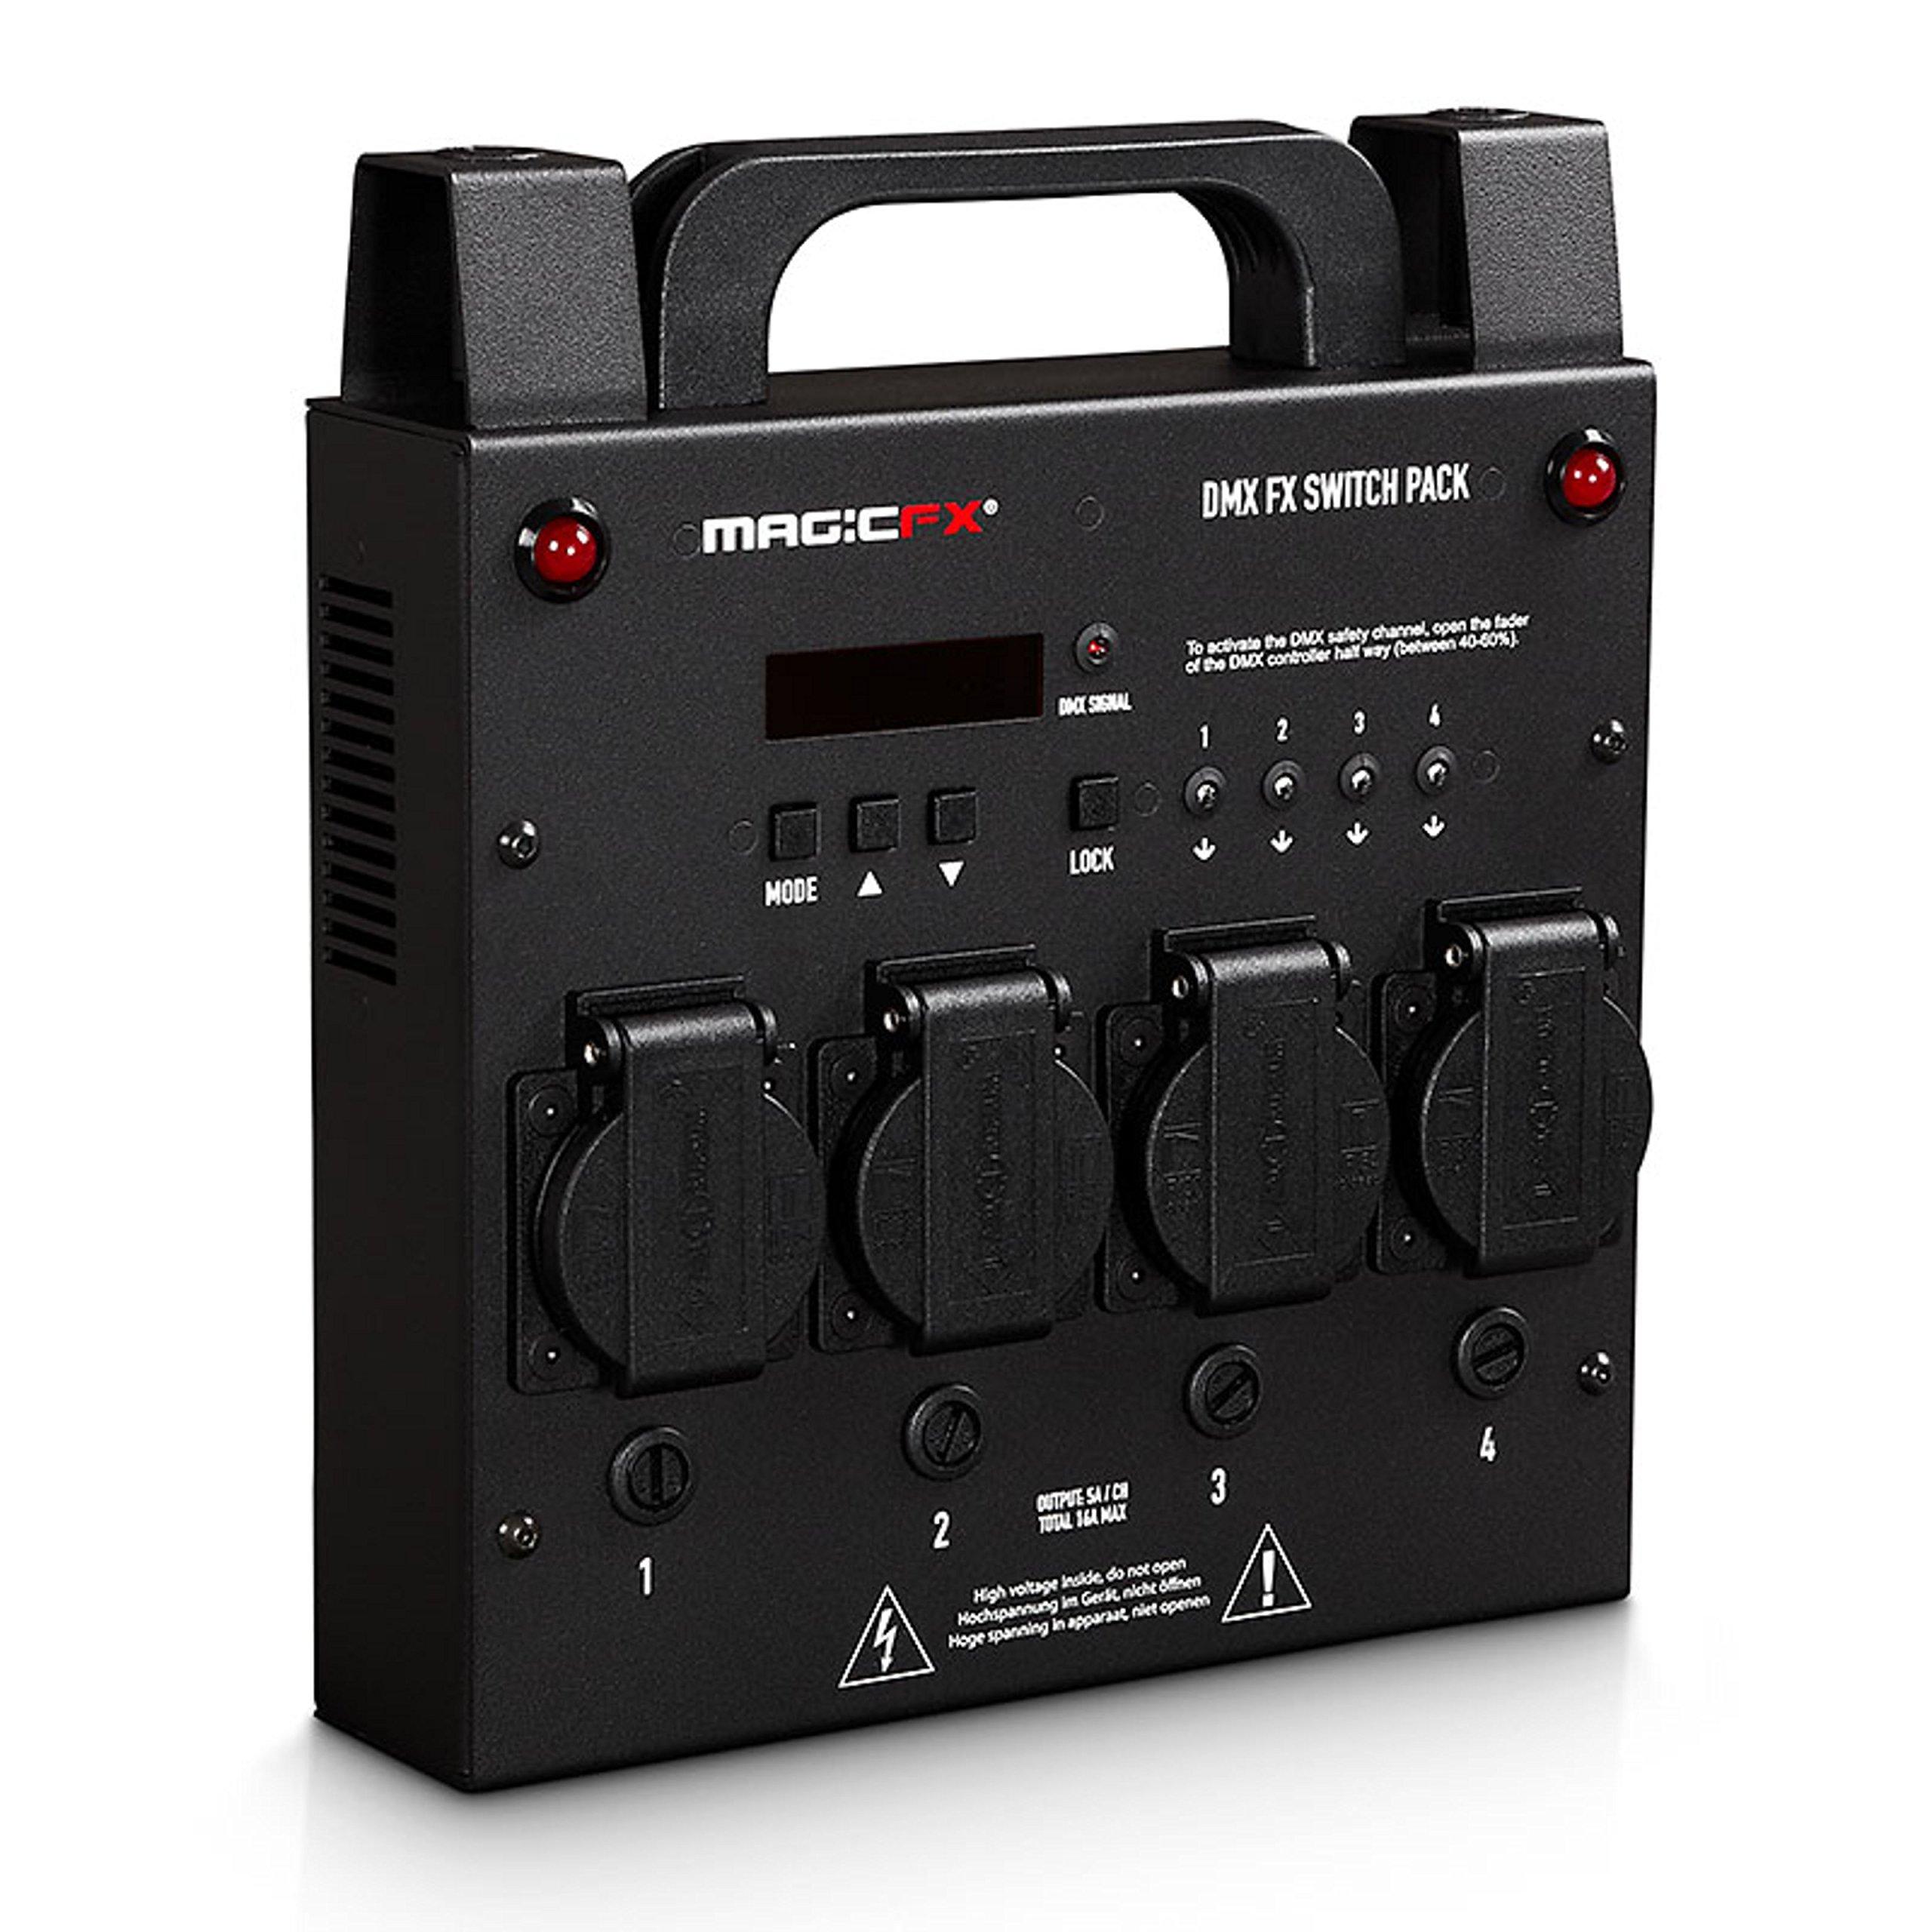 DMX FX Switch Pack 4 Kanal: Amazon.es: Electrónica